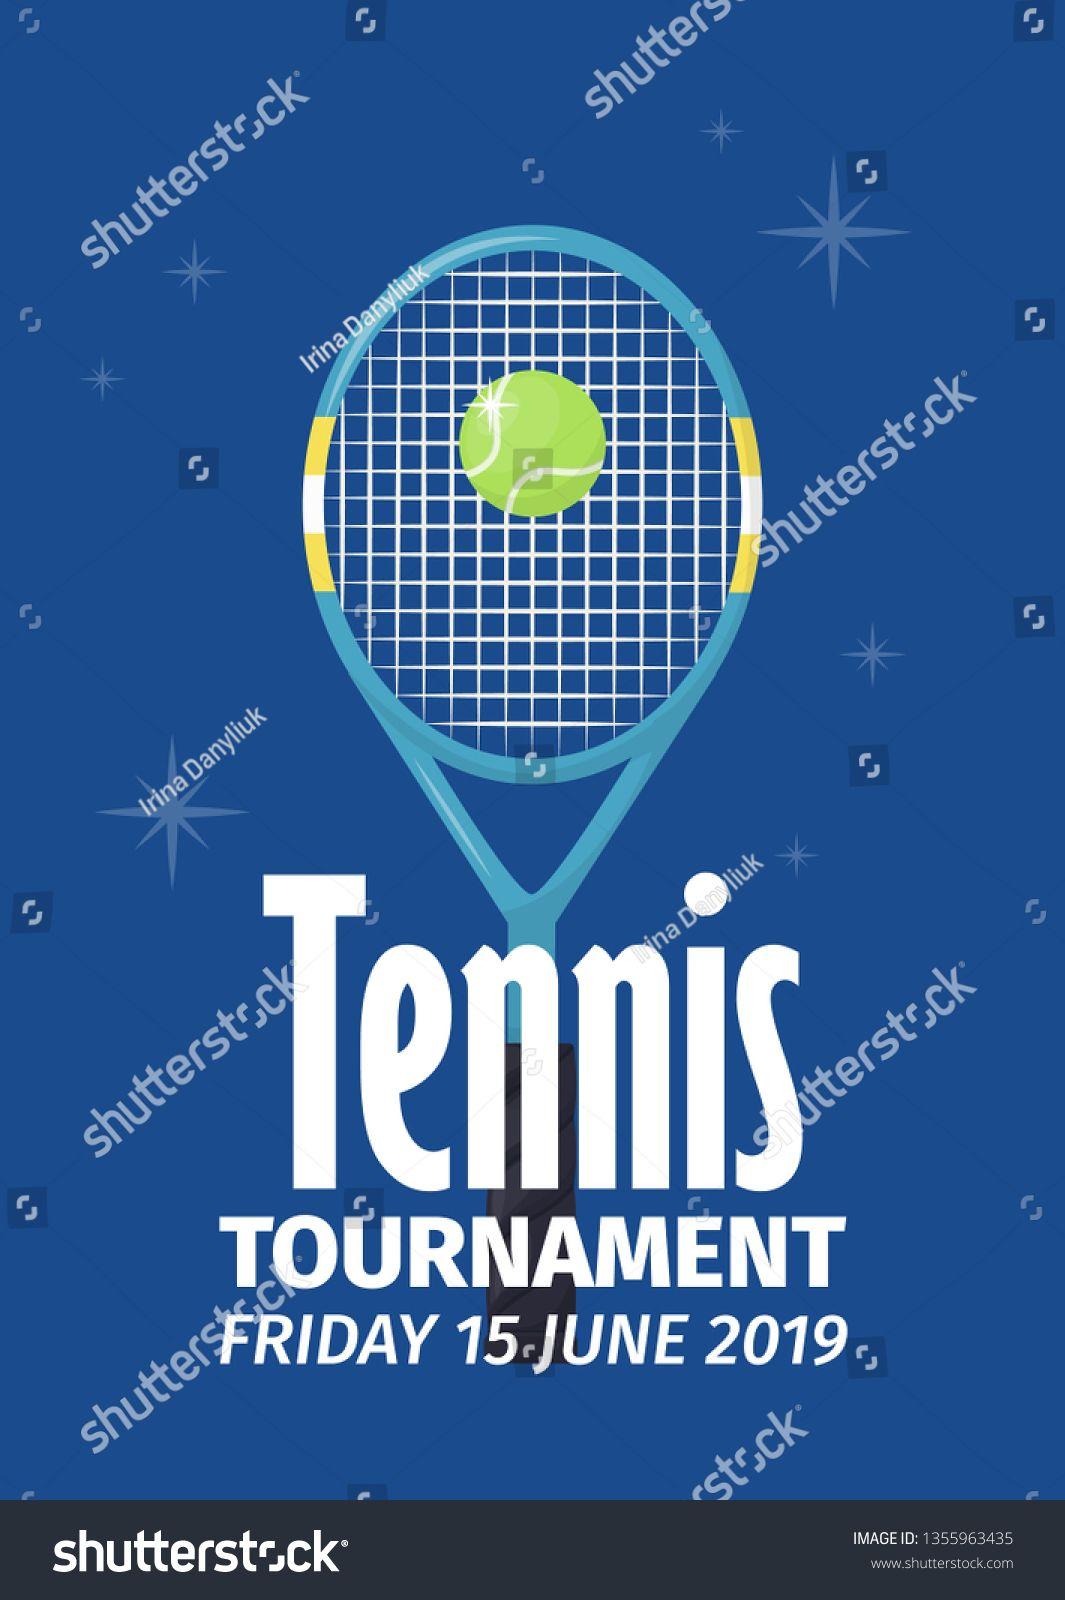 Tennis Tournament Poster With Tennis Ball Shield Flyer Template Vector Illustration Design Spo Vector Illustration Design Shop Small Quotes Shop Window Design